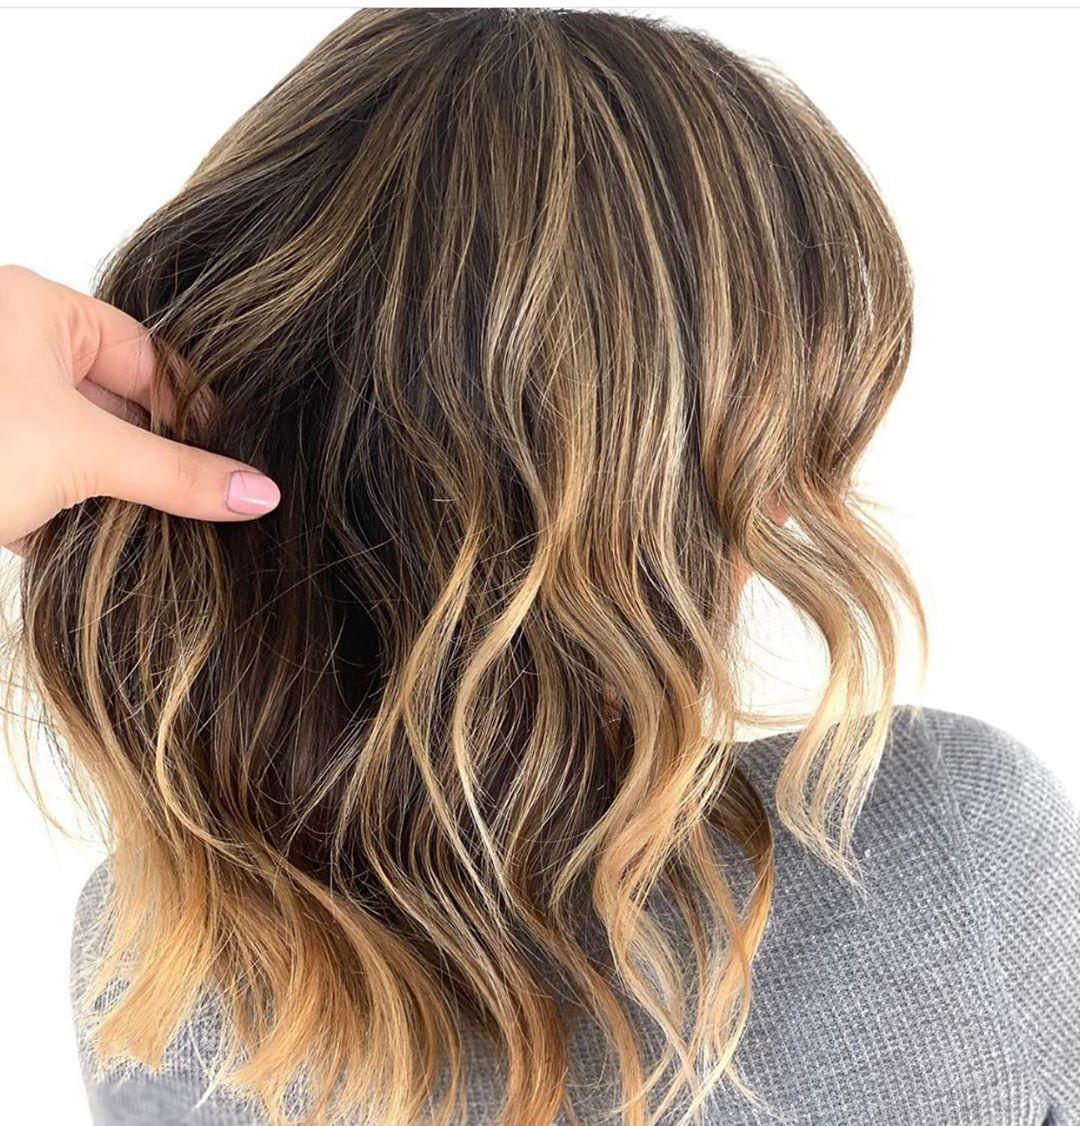 26 Best Braided Hairstyle Ideas In 2020 Hair Styles Medium Hair Styles Long Hair Tutorial